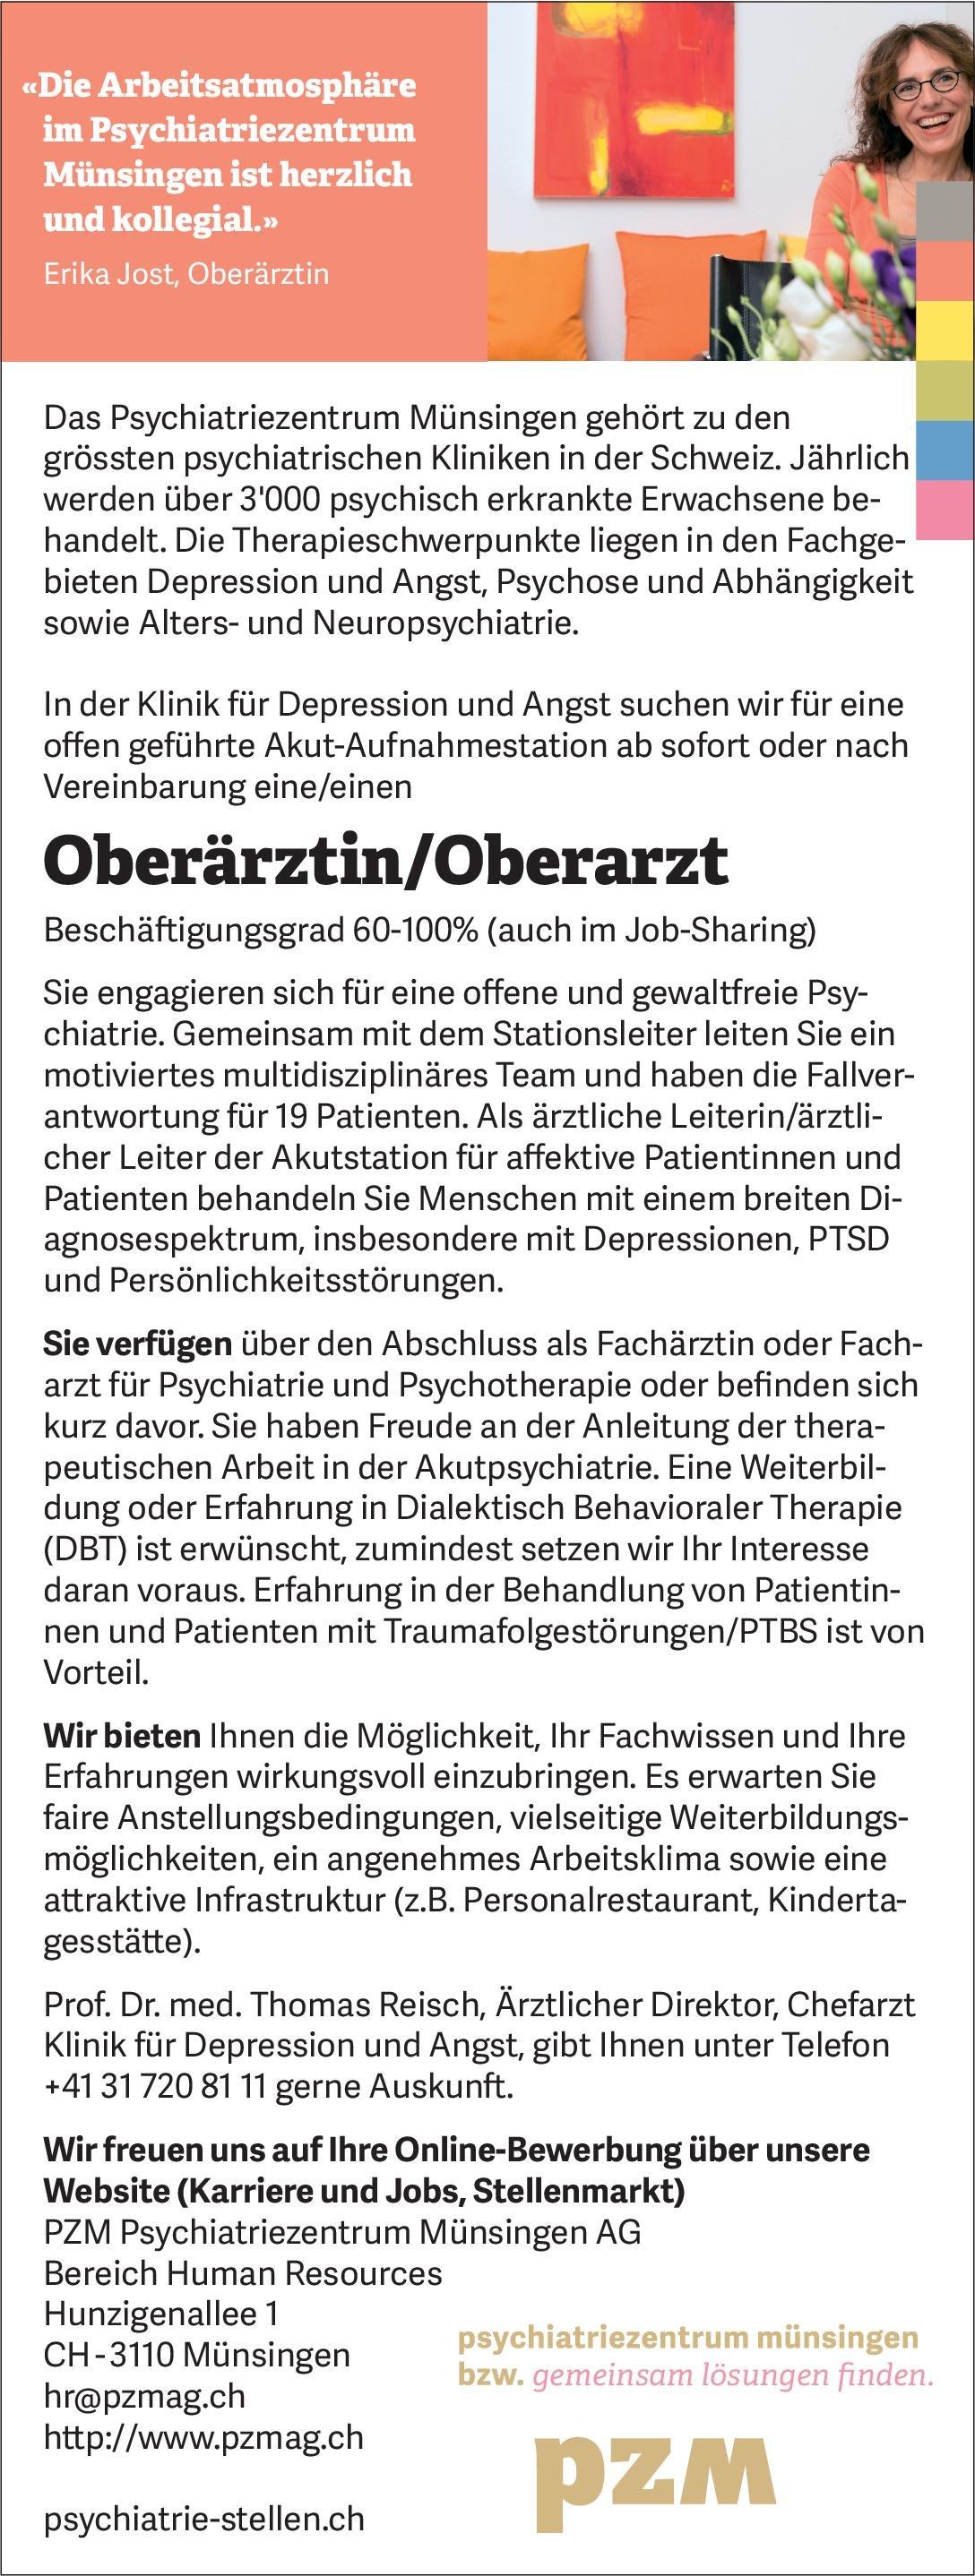 PZMPsychiatriezentrumMünsingen AG Oberärztin/Oberarzt Psychiatrie und Psychotherapie  Psychiatrie und Psychotherapie, Psychiatrie und Psychotherapie Arzt / Facharzt, Oberarzt